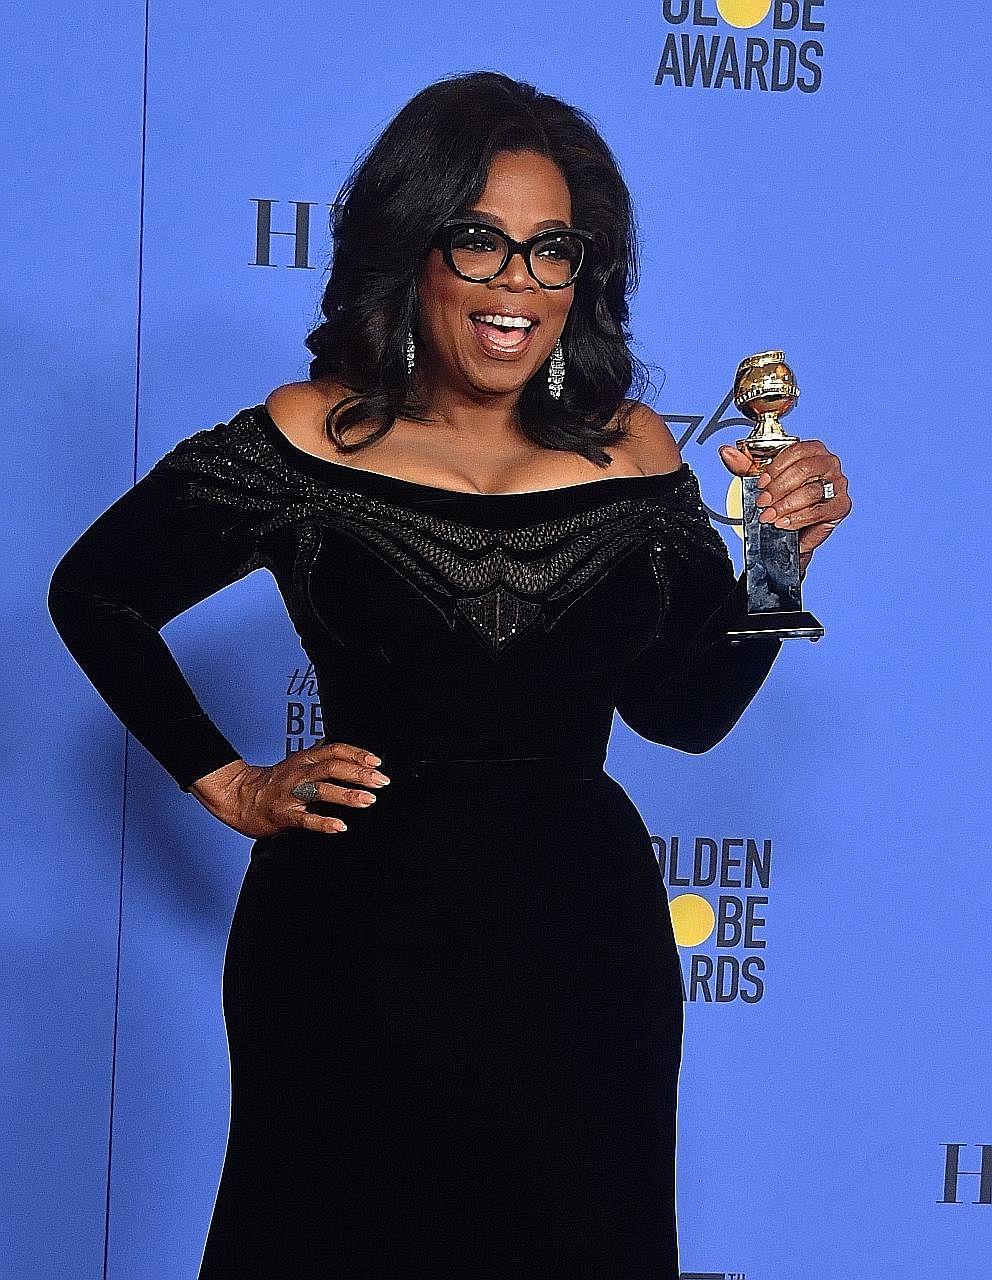 Oprah Winfrey during the 75th Golden Globe Awards on Jan 7. Her speech sparked calls for her to run for president in 2020.